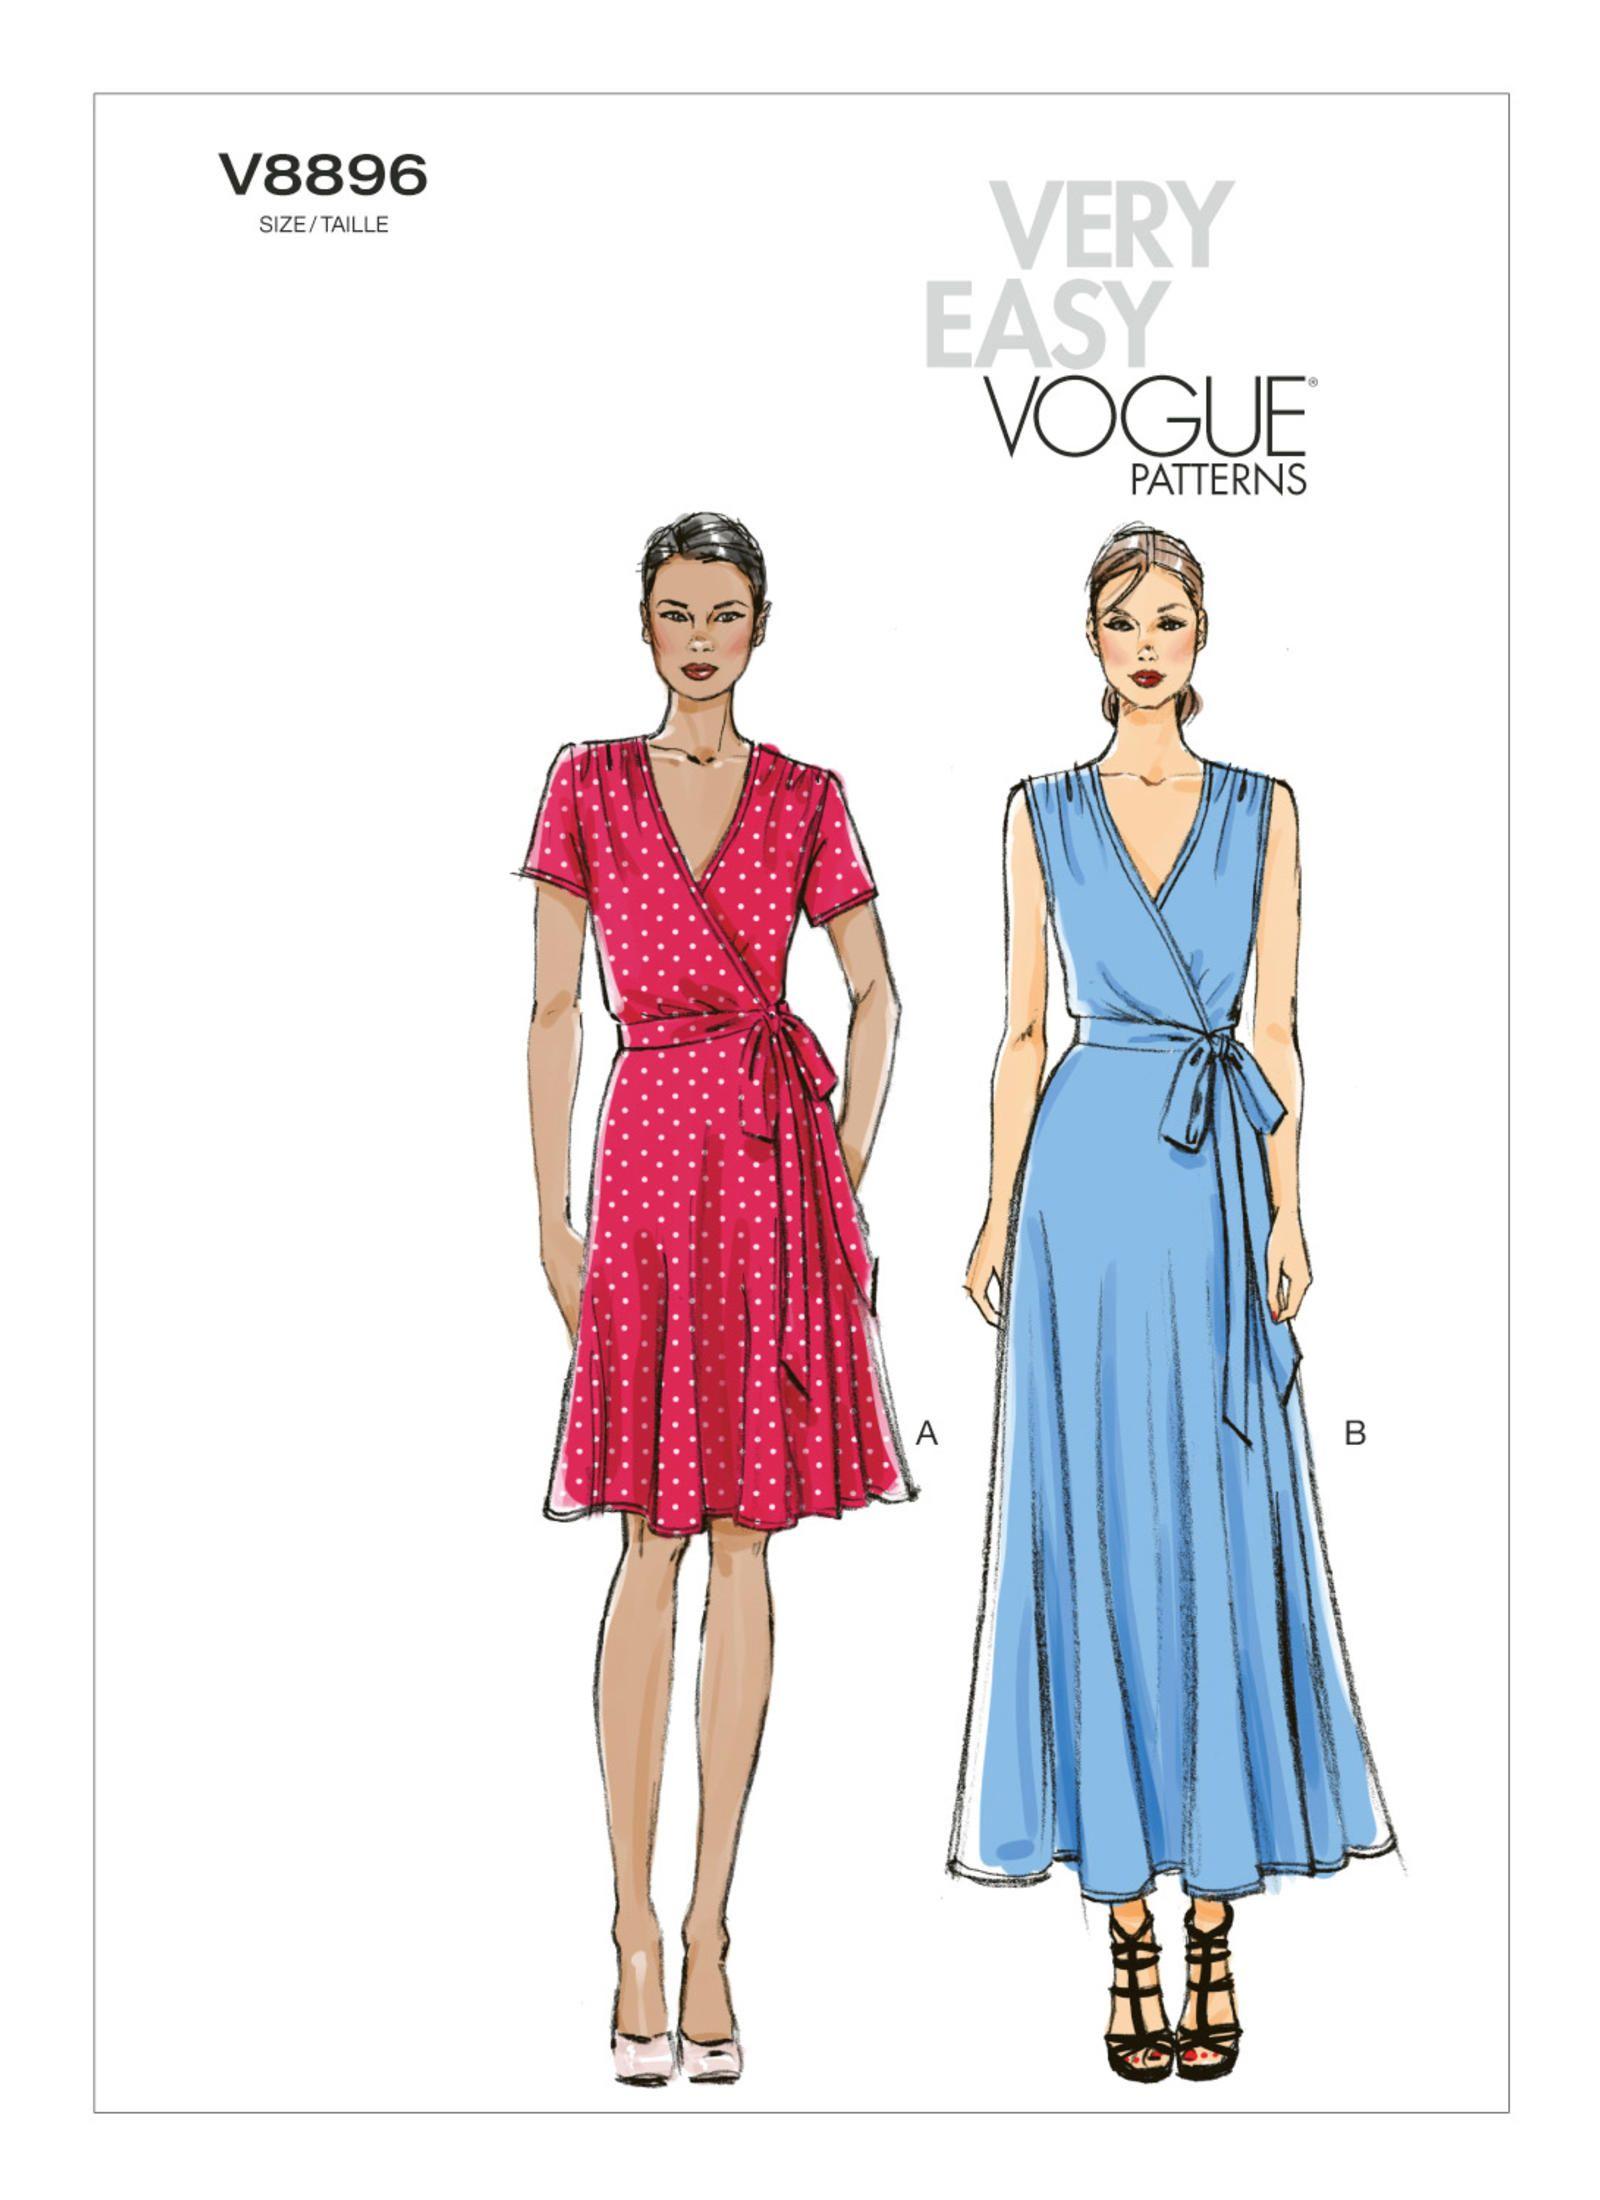 V8896 | Vogue Patterns | Sewing 24 | Pinterest | Patrones, Patrones ...